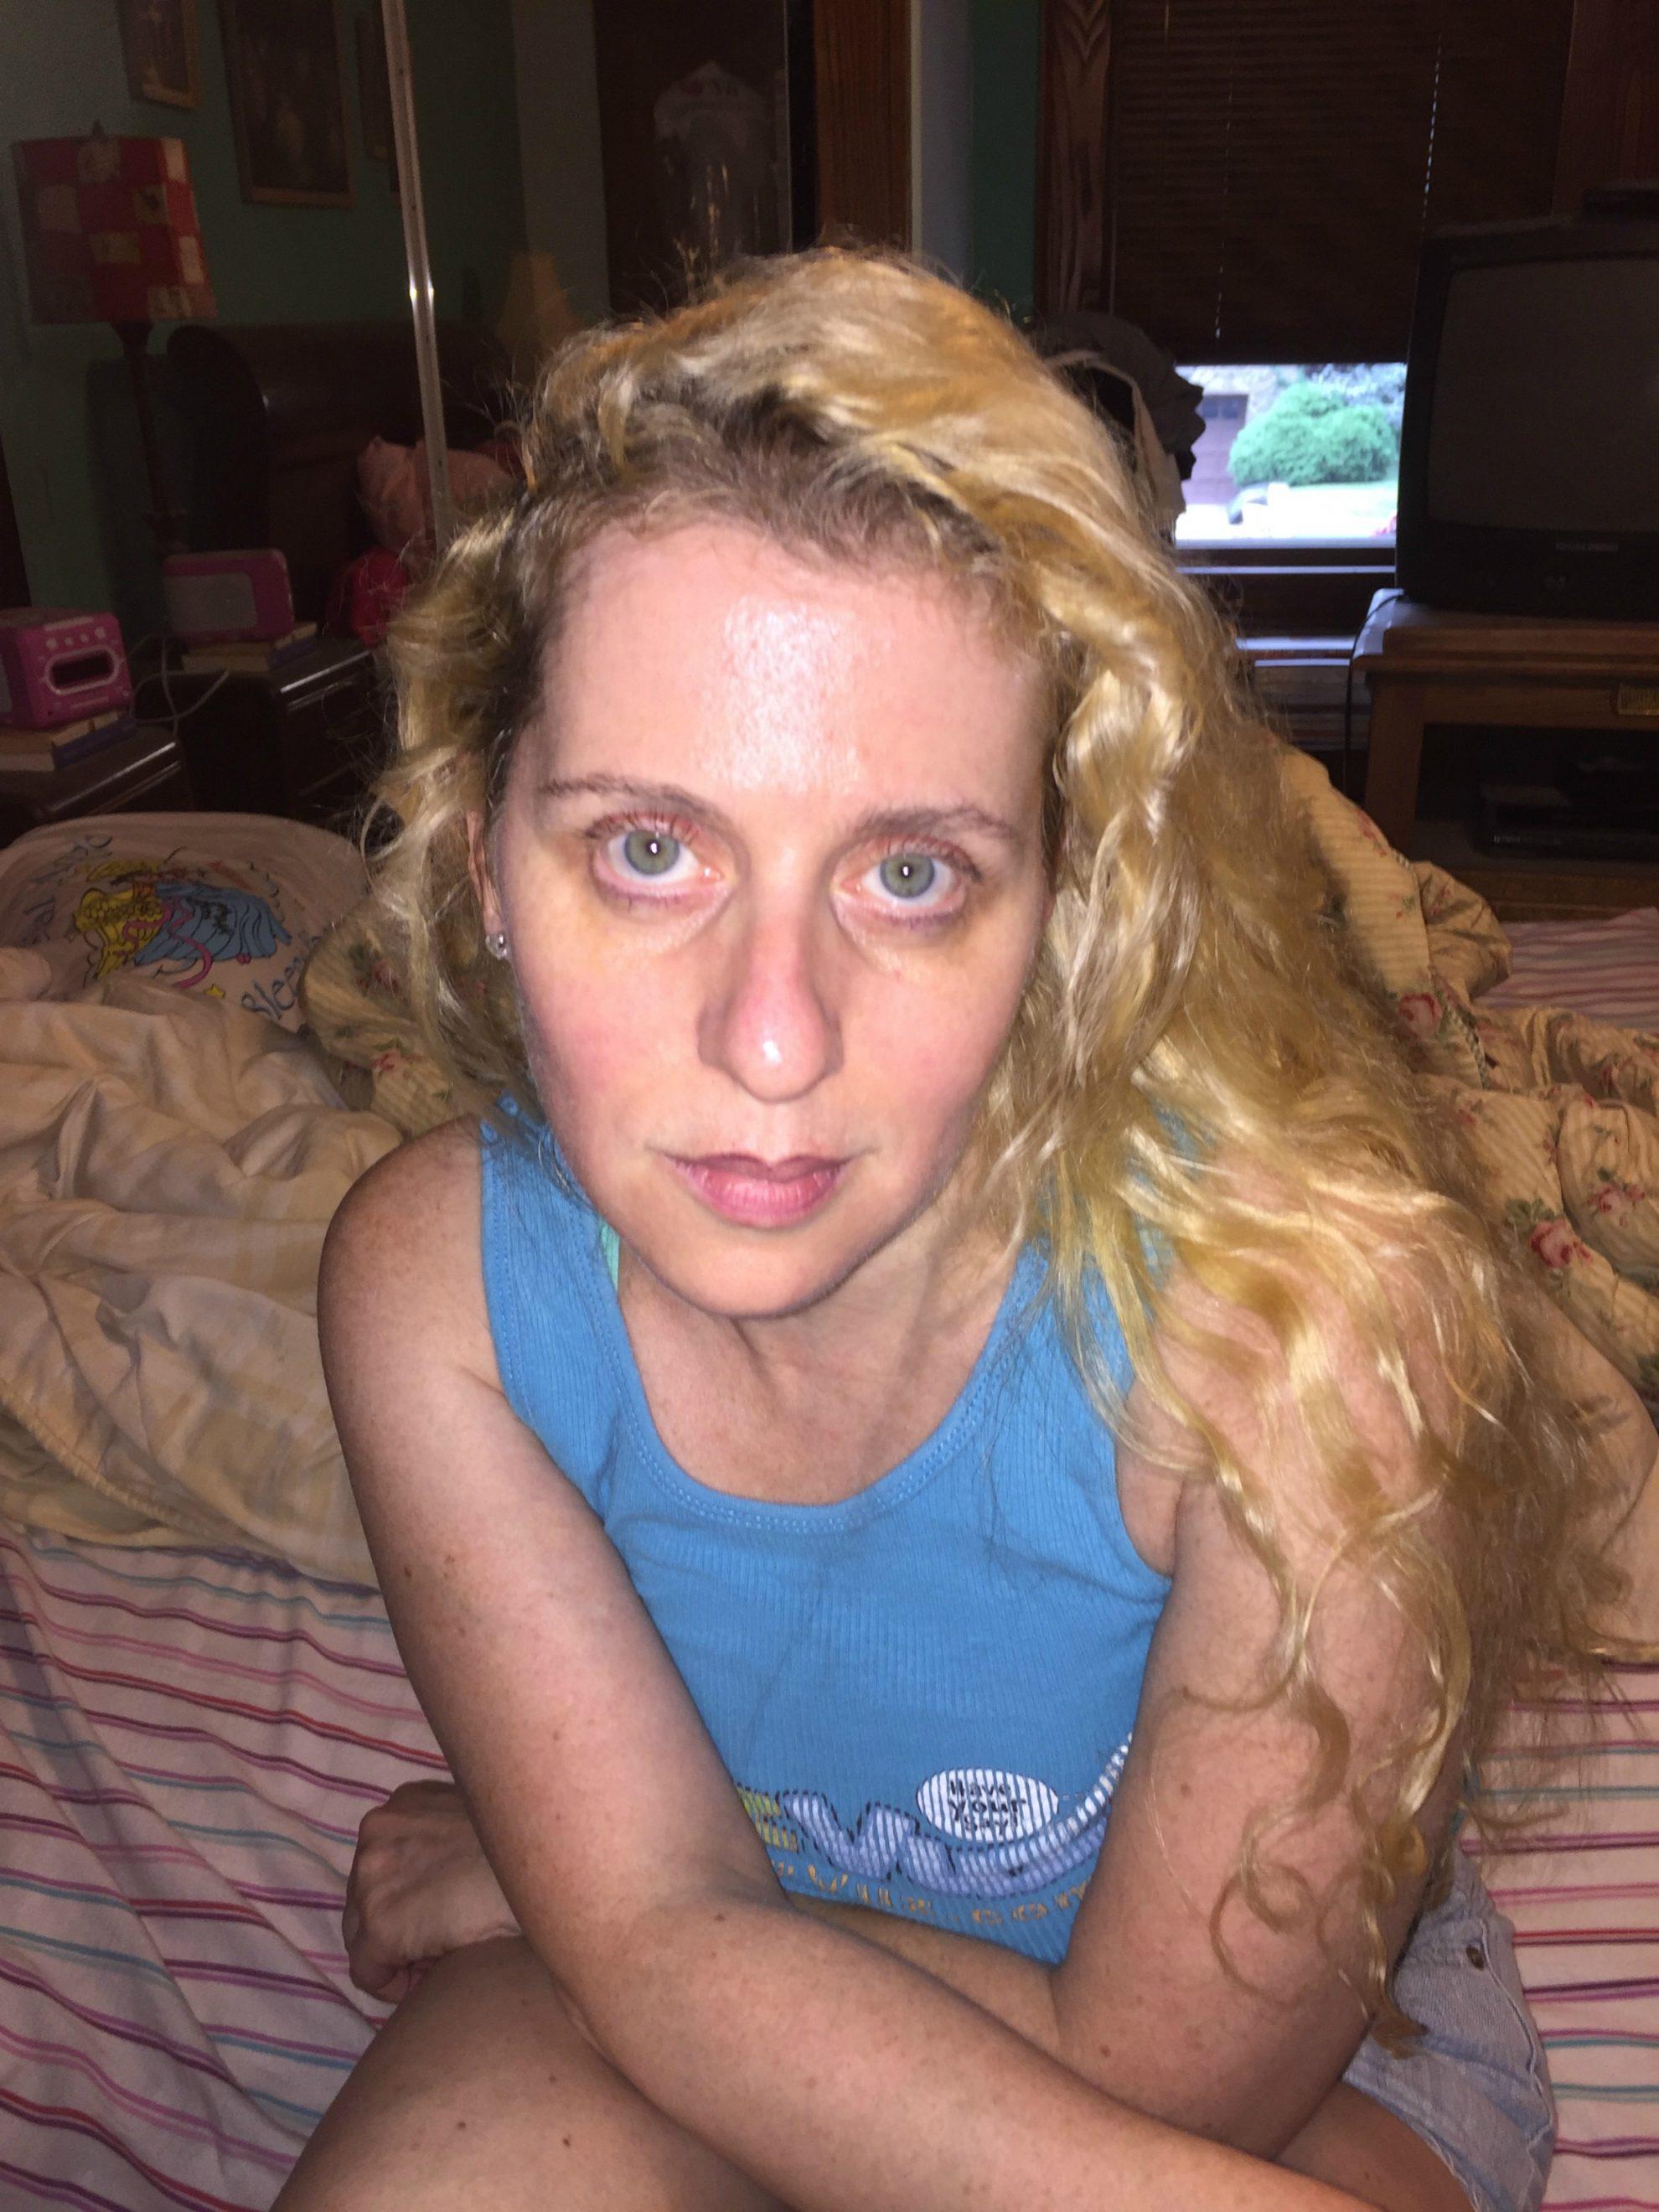 Day four of my 4 Neutrogena Rapid Wrinkle Repair photo diary